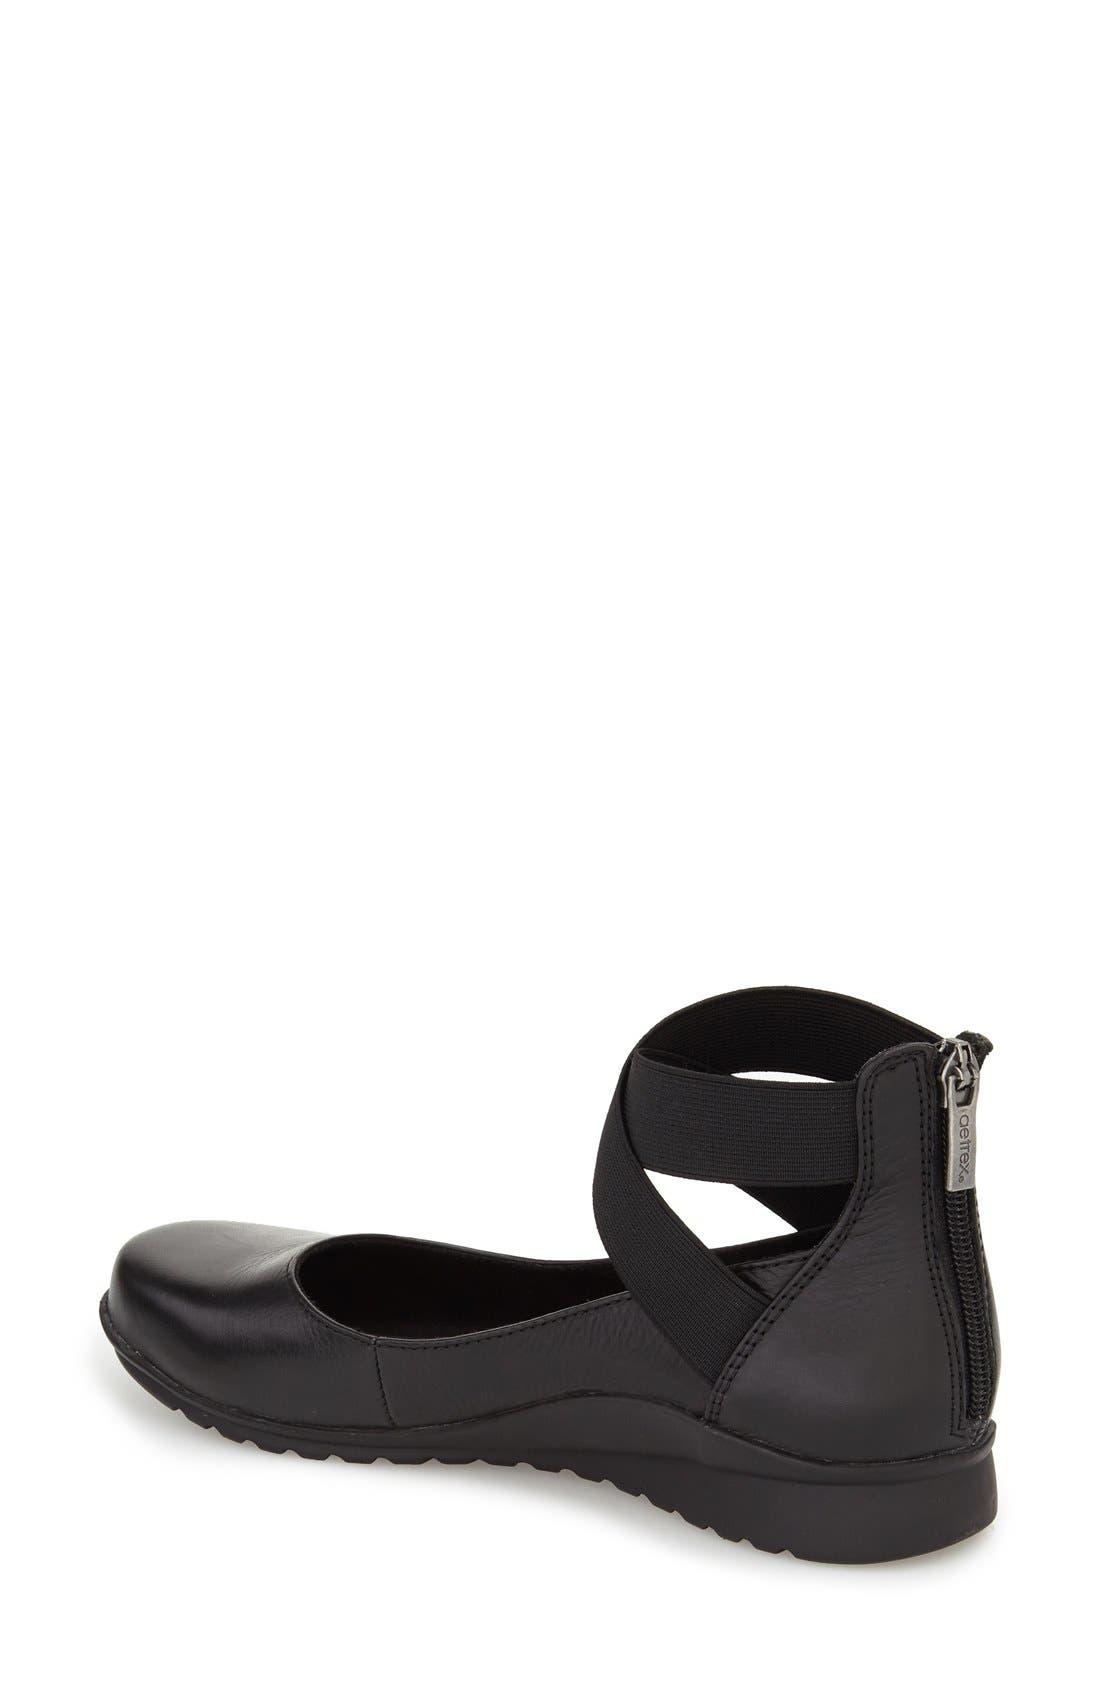 AETREX,                             'Dakota' Ankle Strap Ballet Flat,                             Alternate thumbnail 2, color,                             BLACK LEATHER